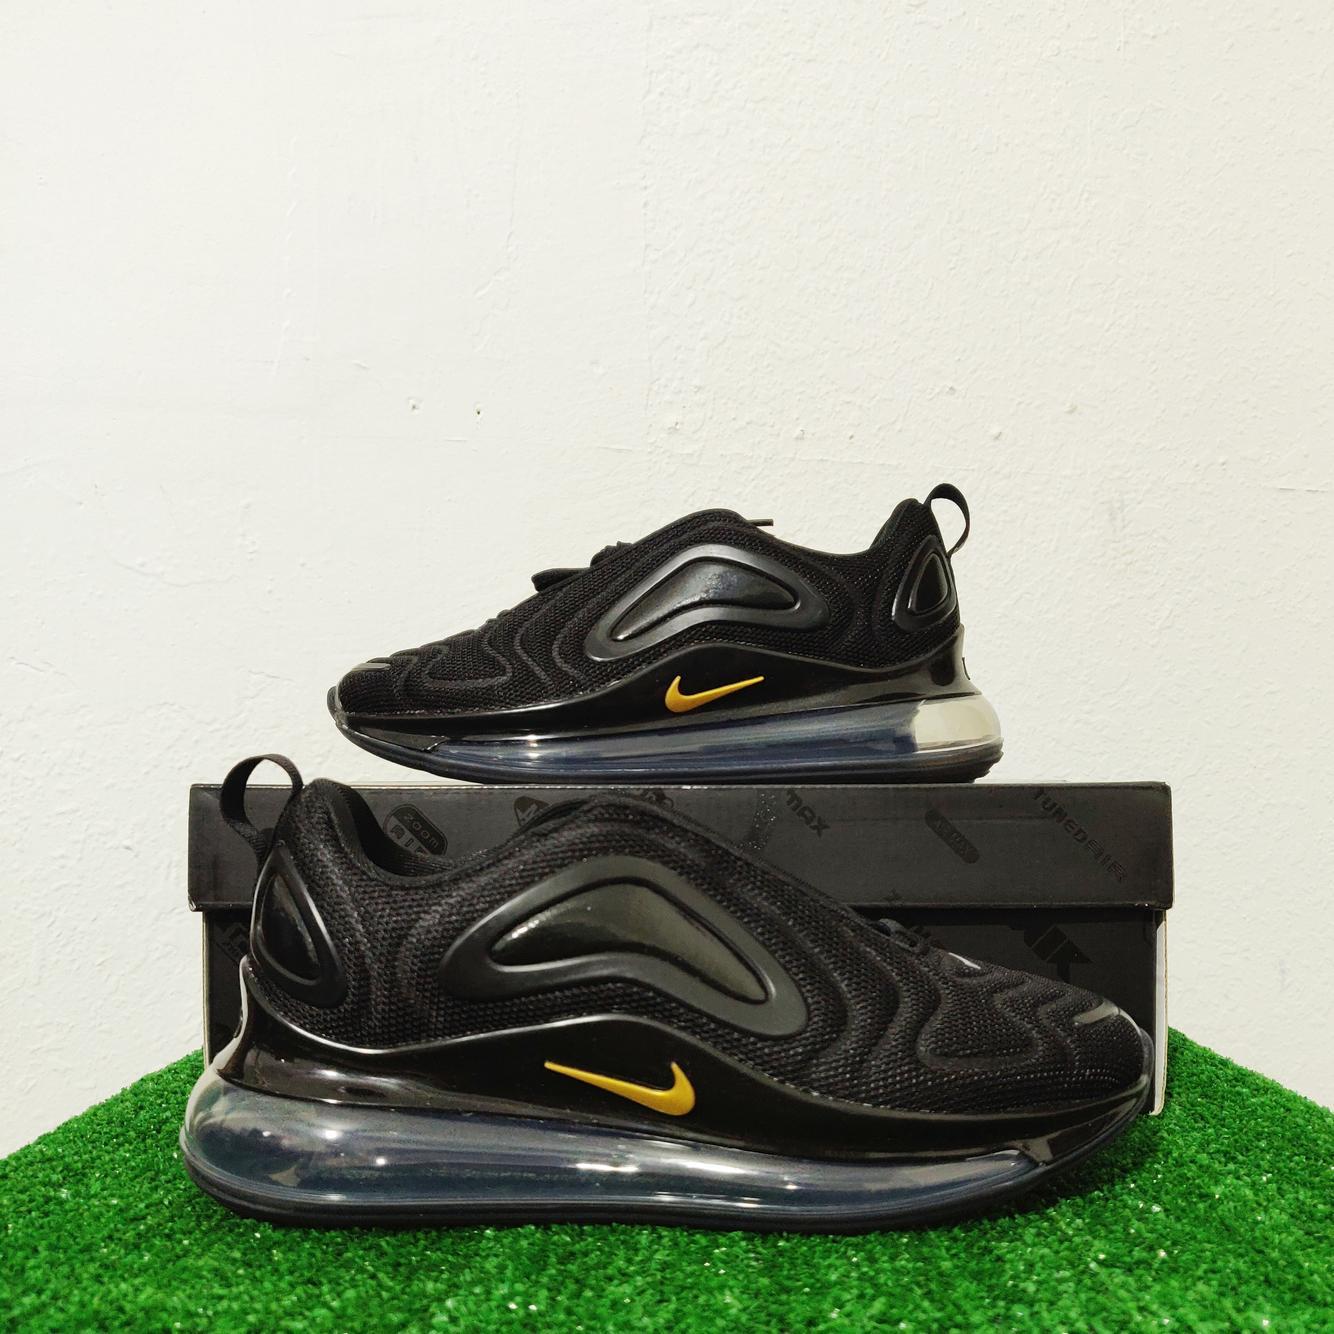 Nike Air Max 720 Black Gold Women's